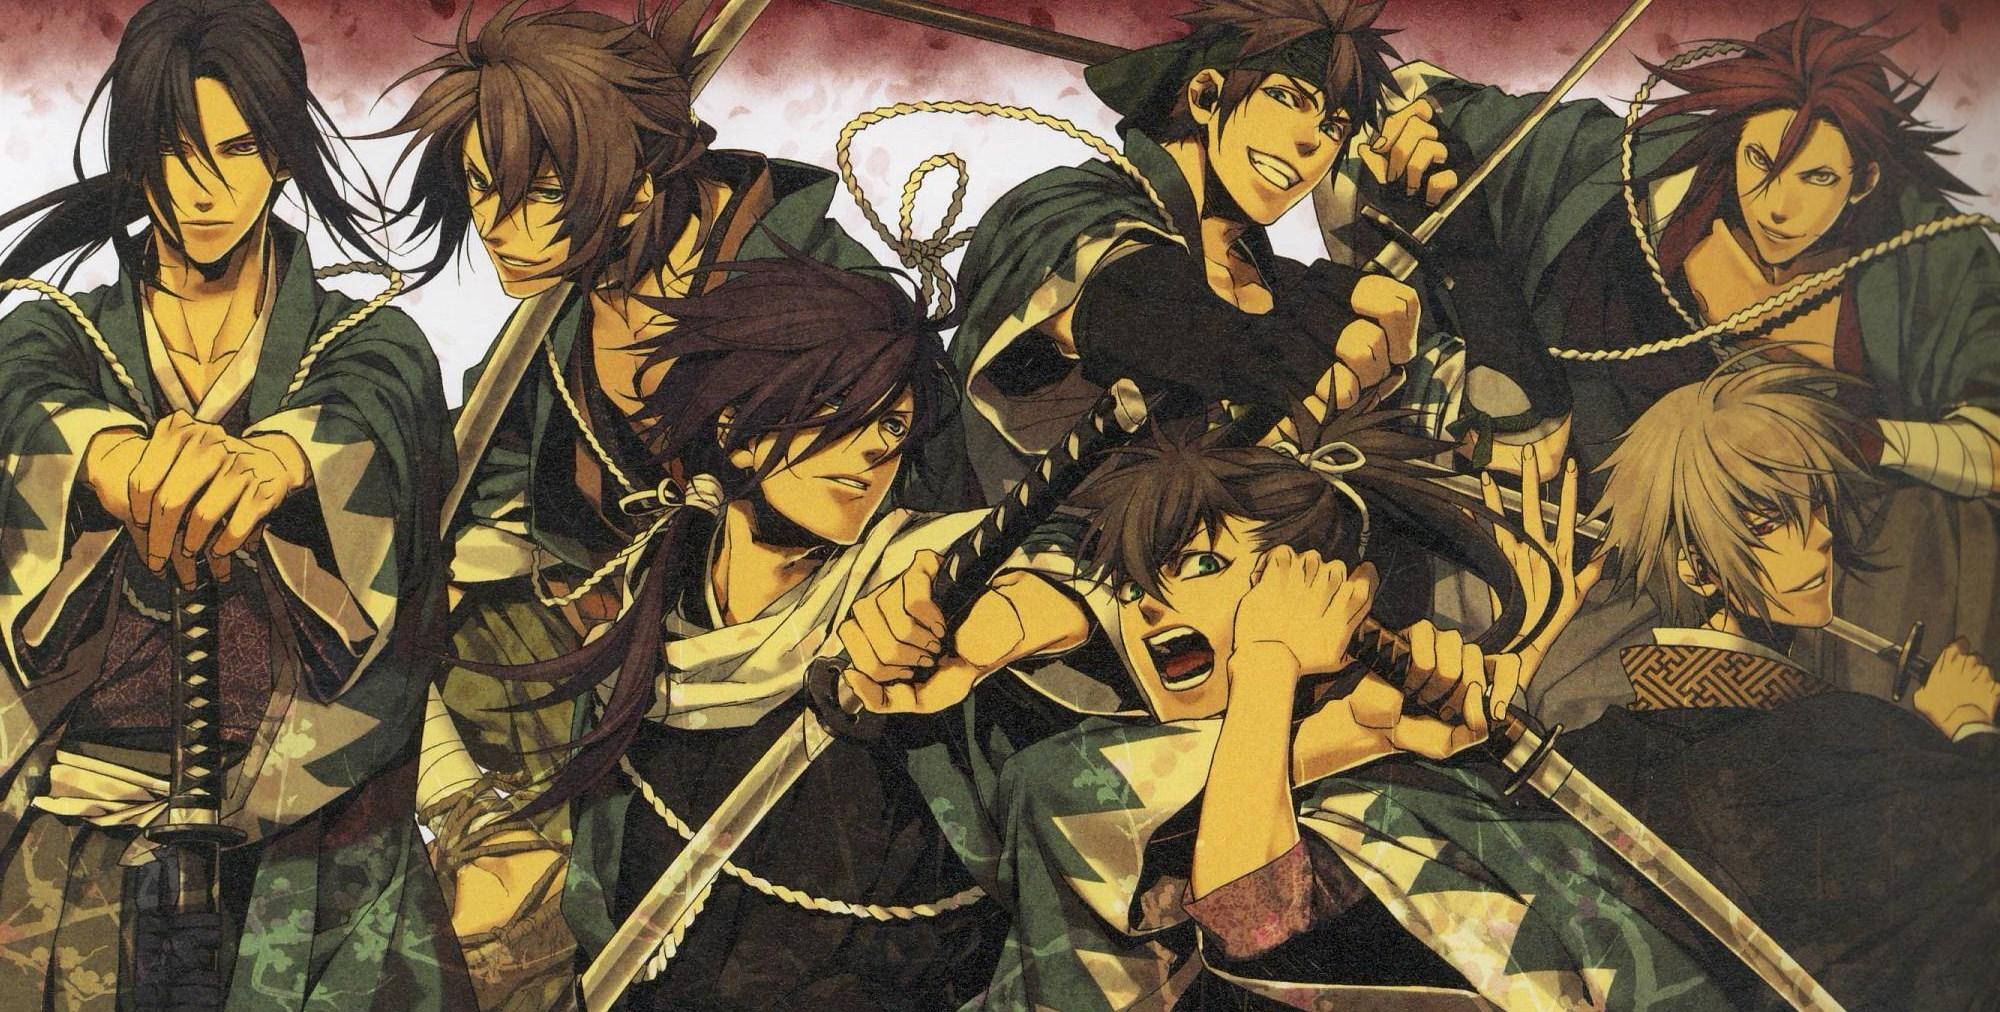 hakuouki-shinsengumi-kitan-anime-guys-34575571-2000-1012.jpg